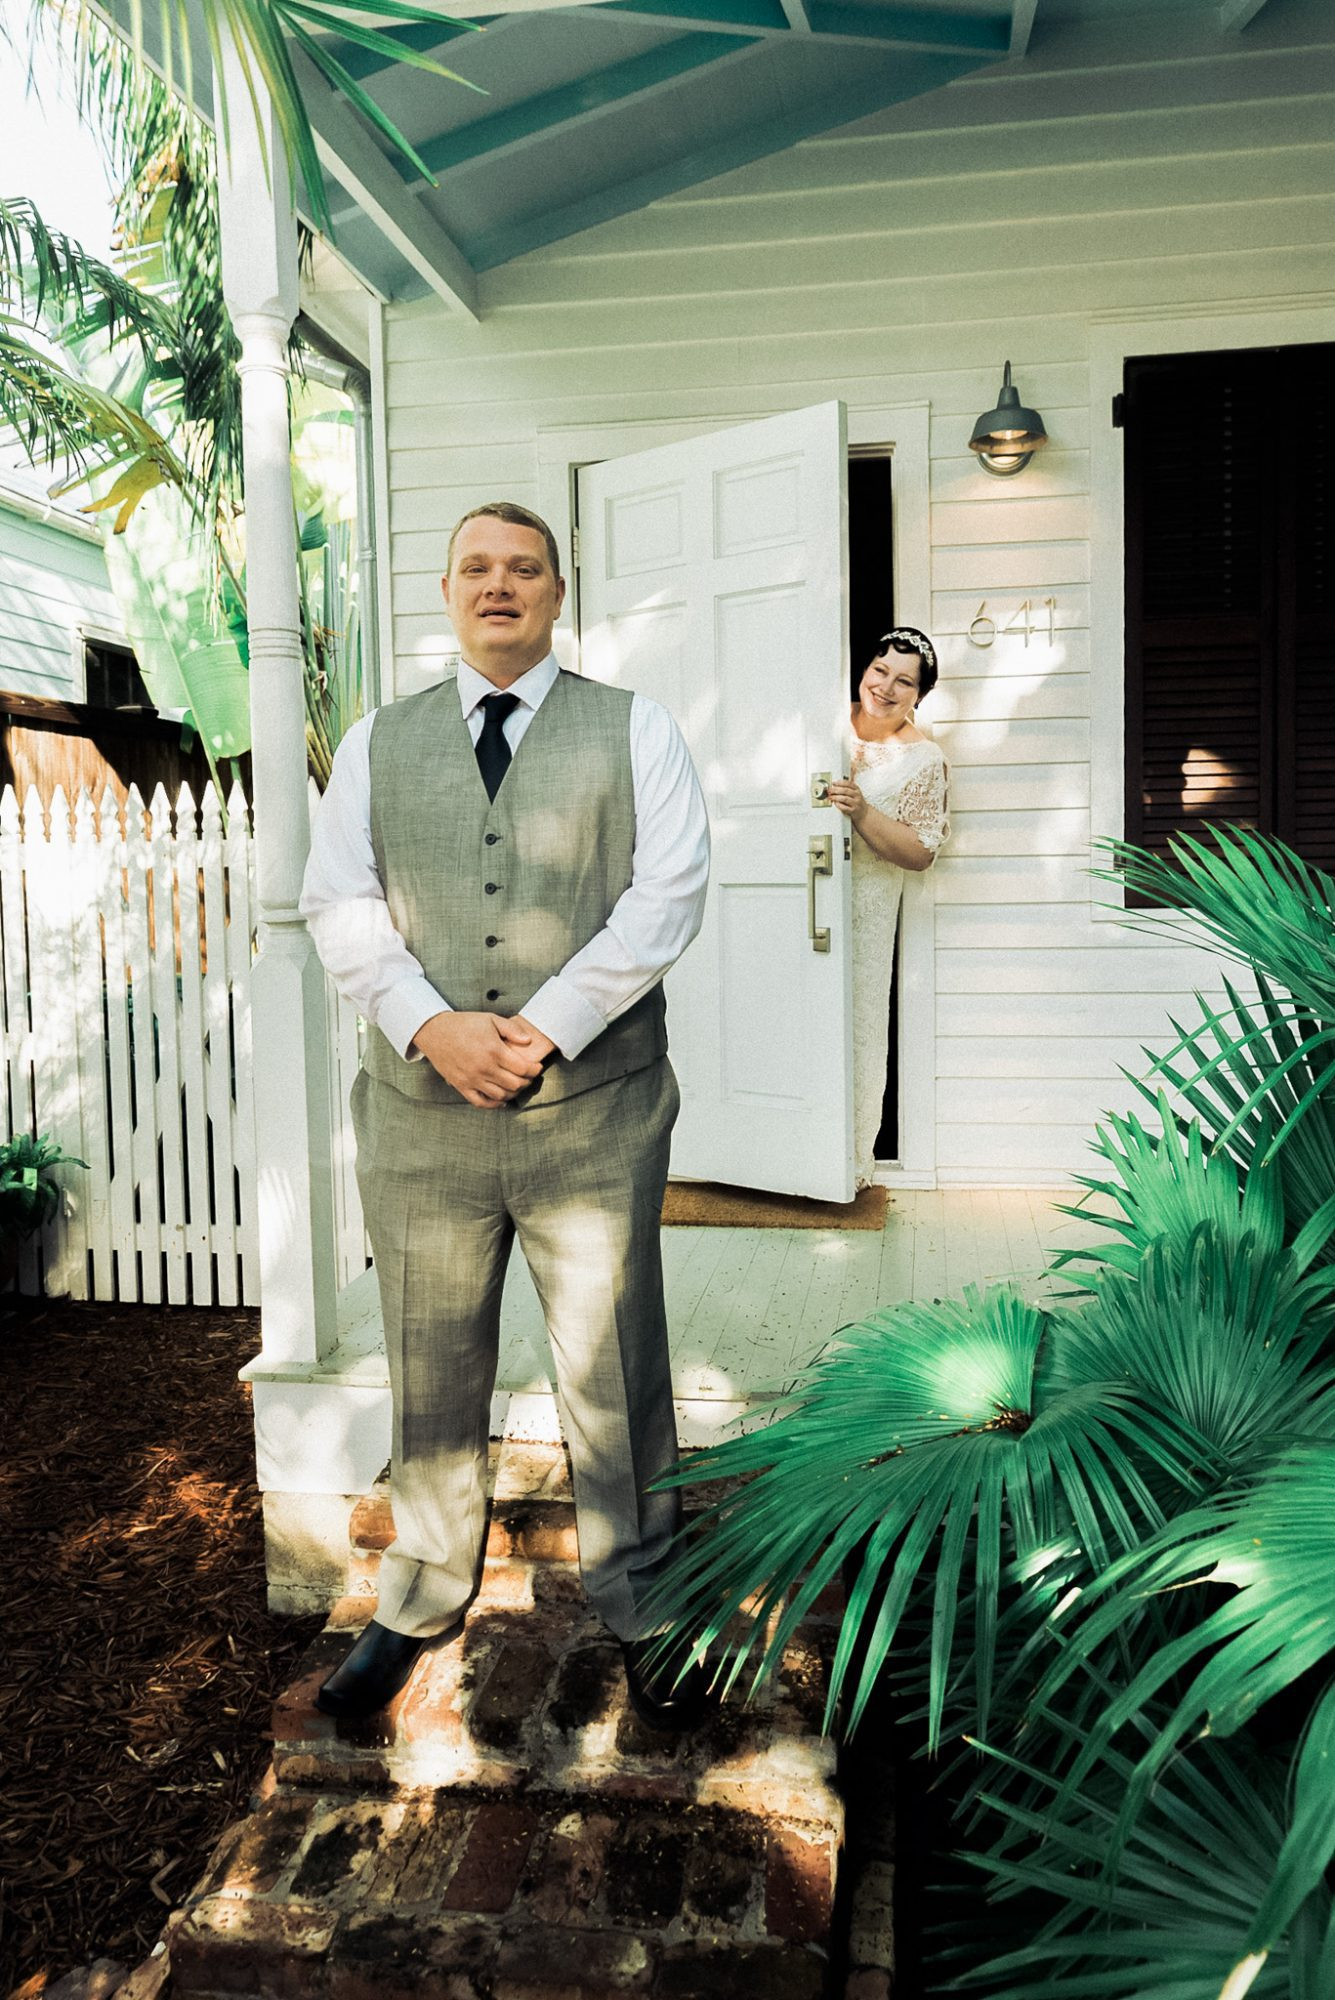 Becca and Leigh Hemingway Home Key West 54 - Becca & Leigh - Key West Wedding Photographer - Ernest Hemingway House